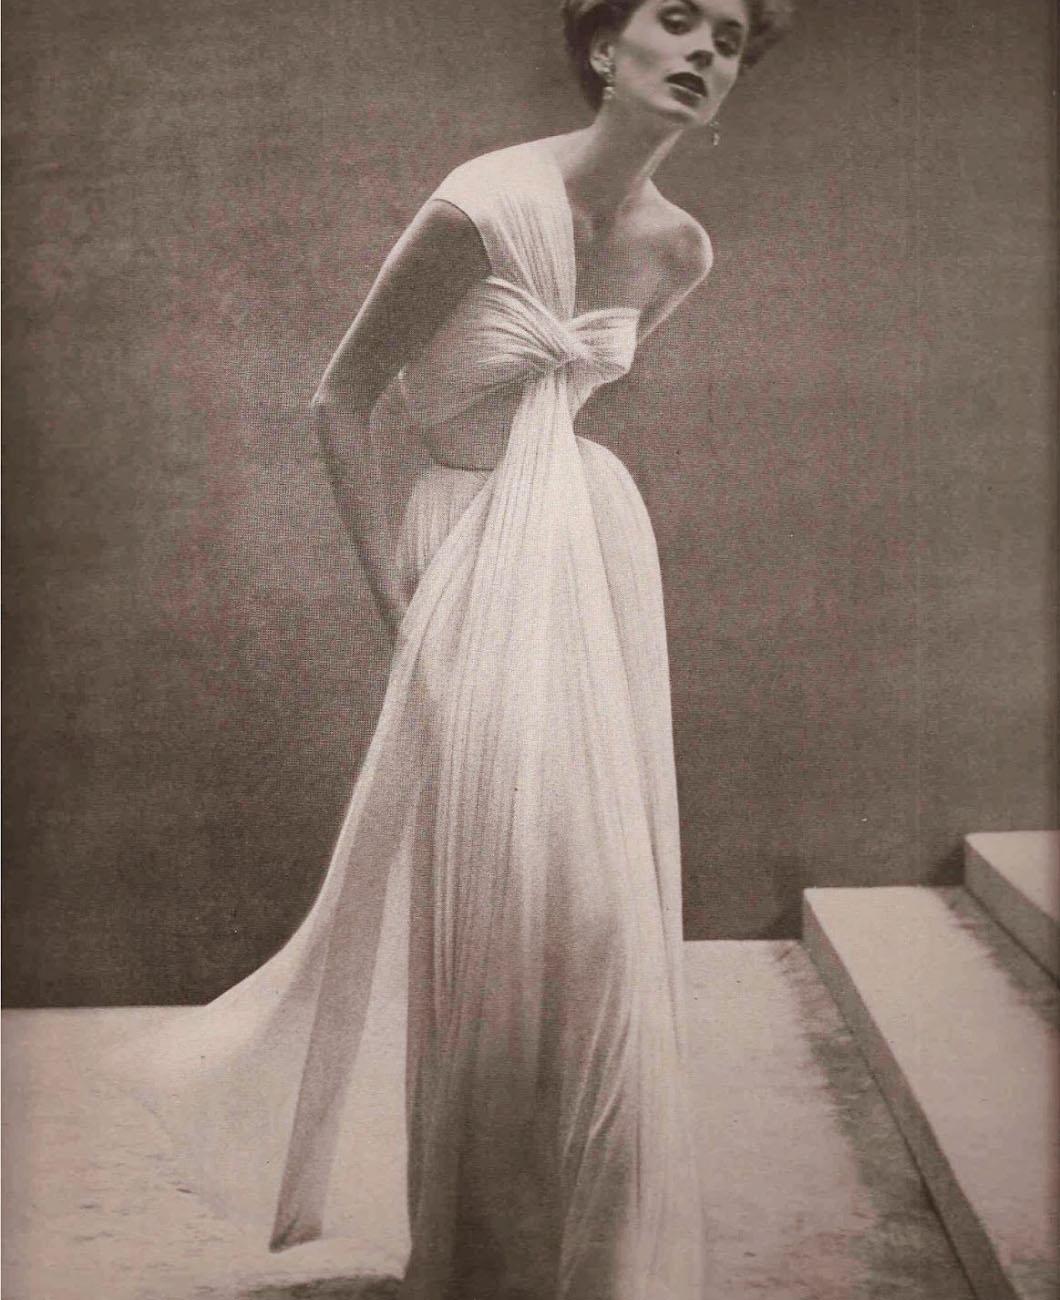 madame-gres-la-polo-lapolo-drape-draping-styles-fashion-vintage-fad-trend